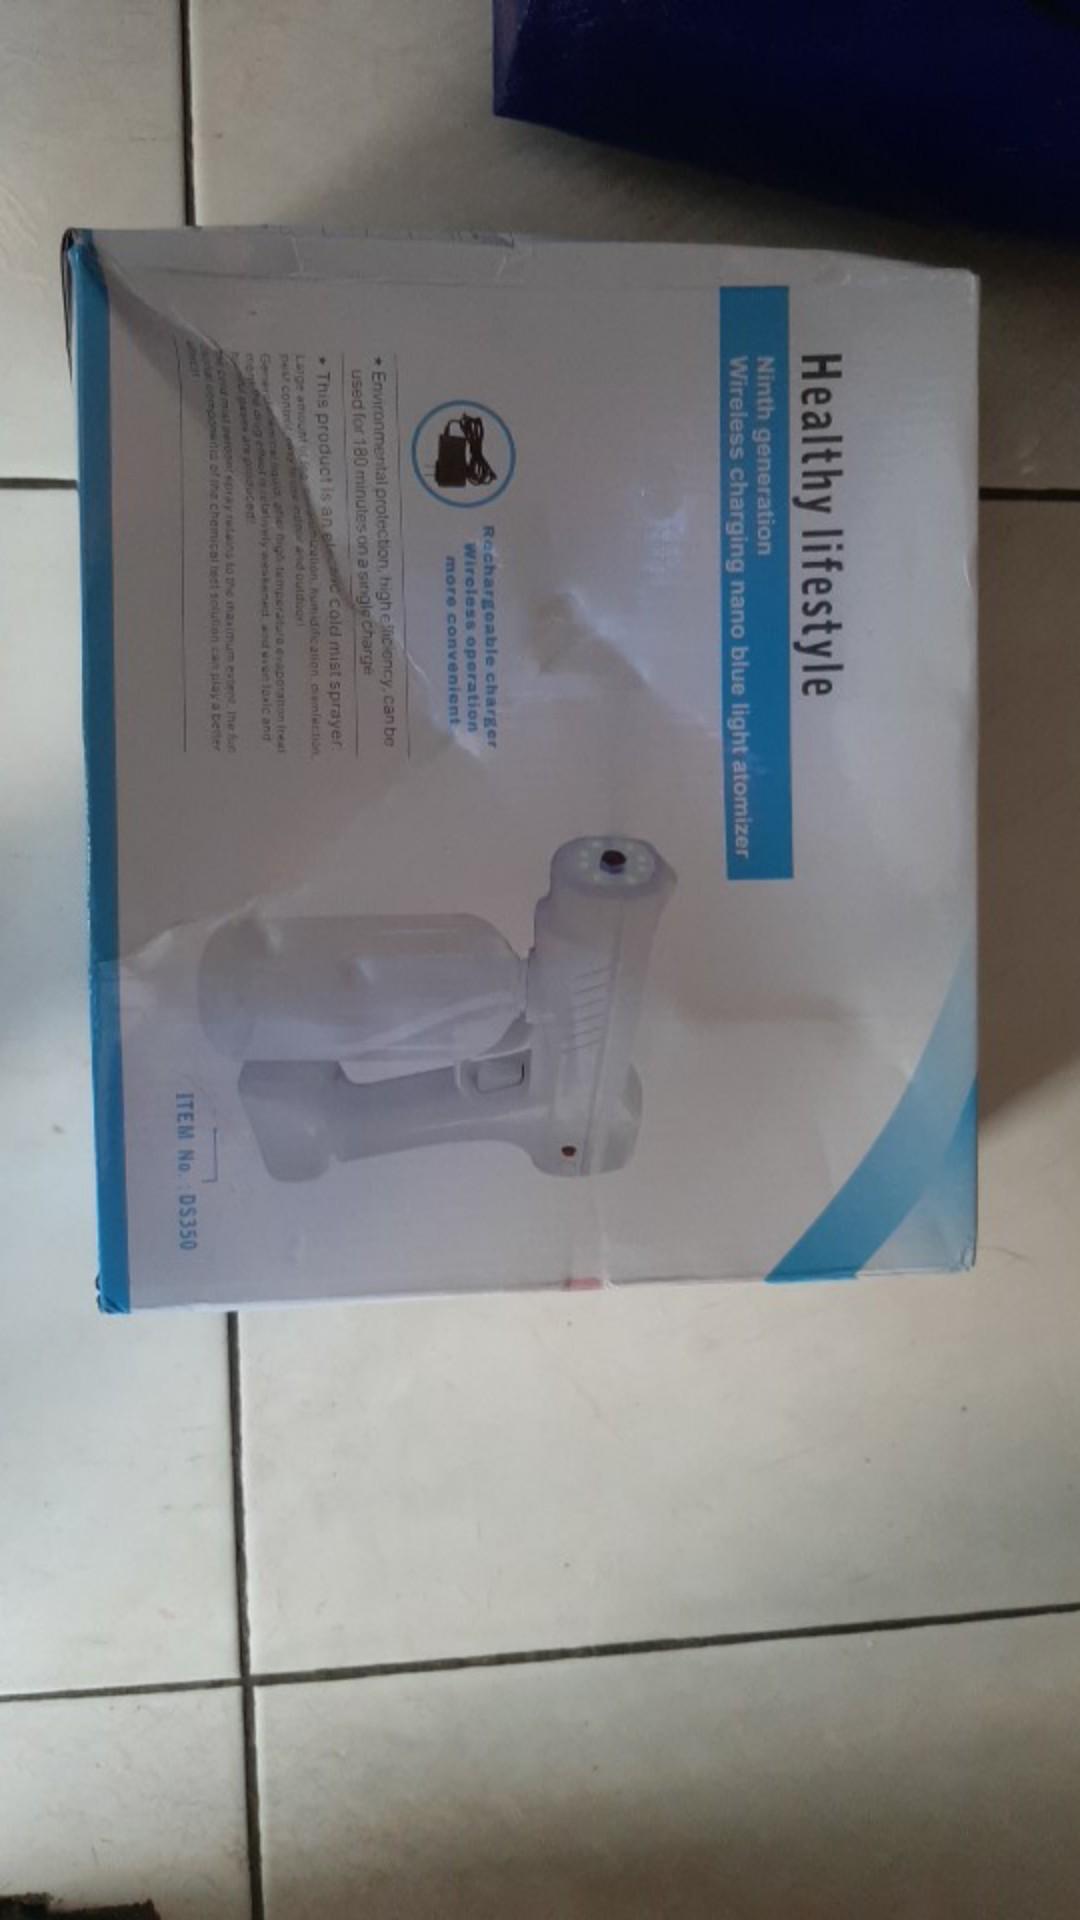 Msia Stock Nano Steam Mist Spray Gun Wireless Atomizer Hand Sanitizer Disinfectant Gum Sanitiser Machine Disinfection Shopee Malaysia